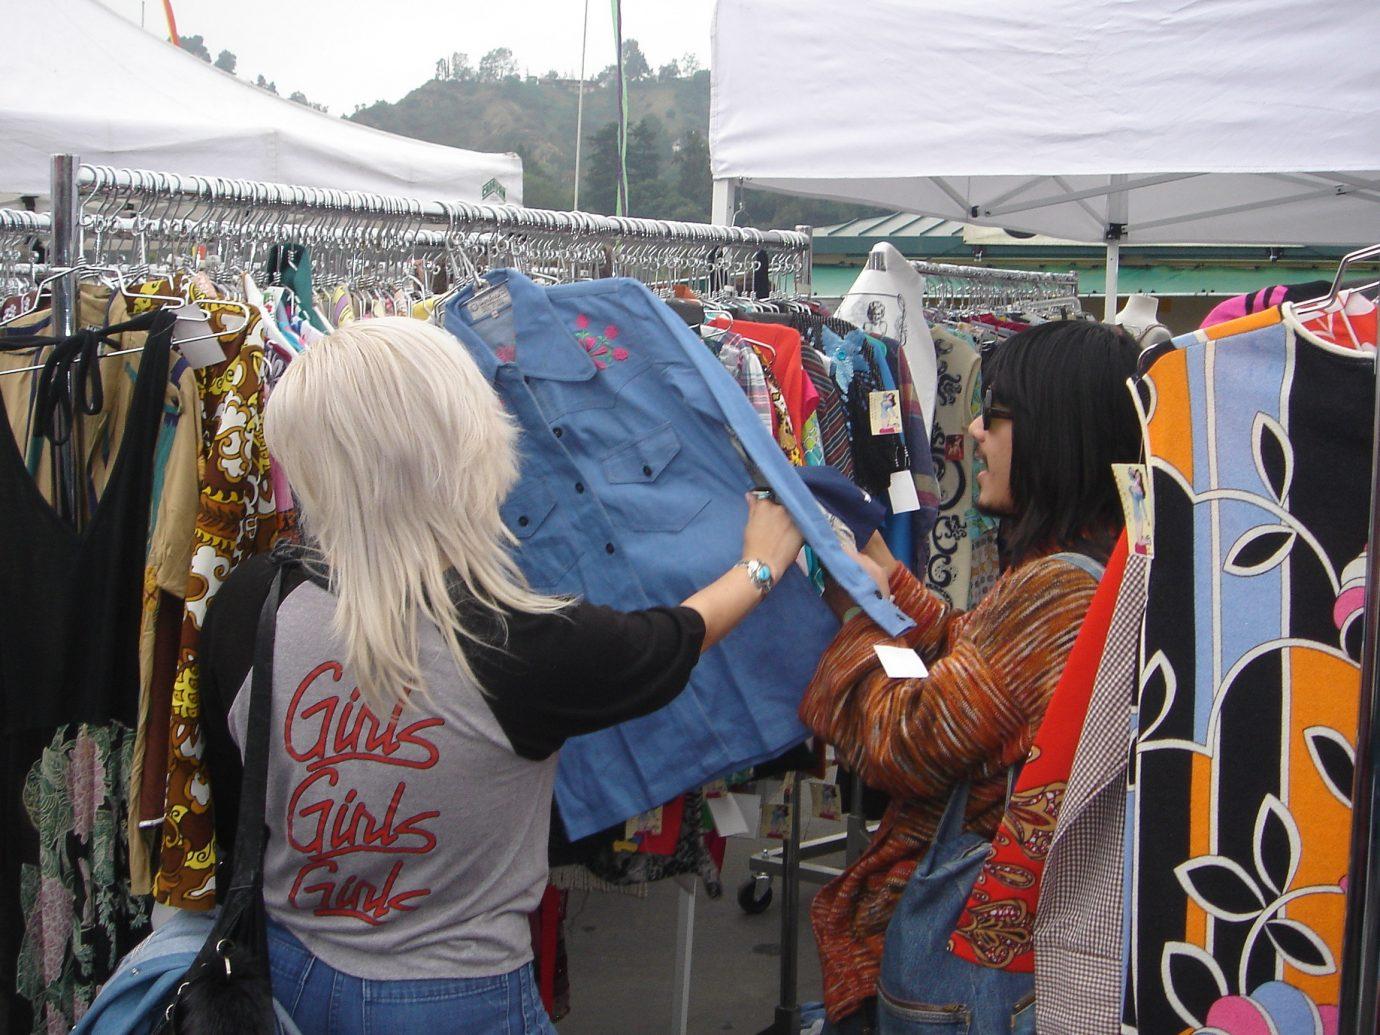 Trip Ideas person sky crowd outdoor City vendor street fair market endurance